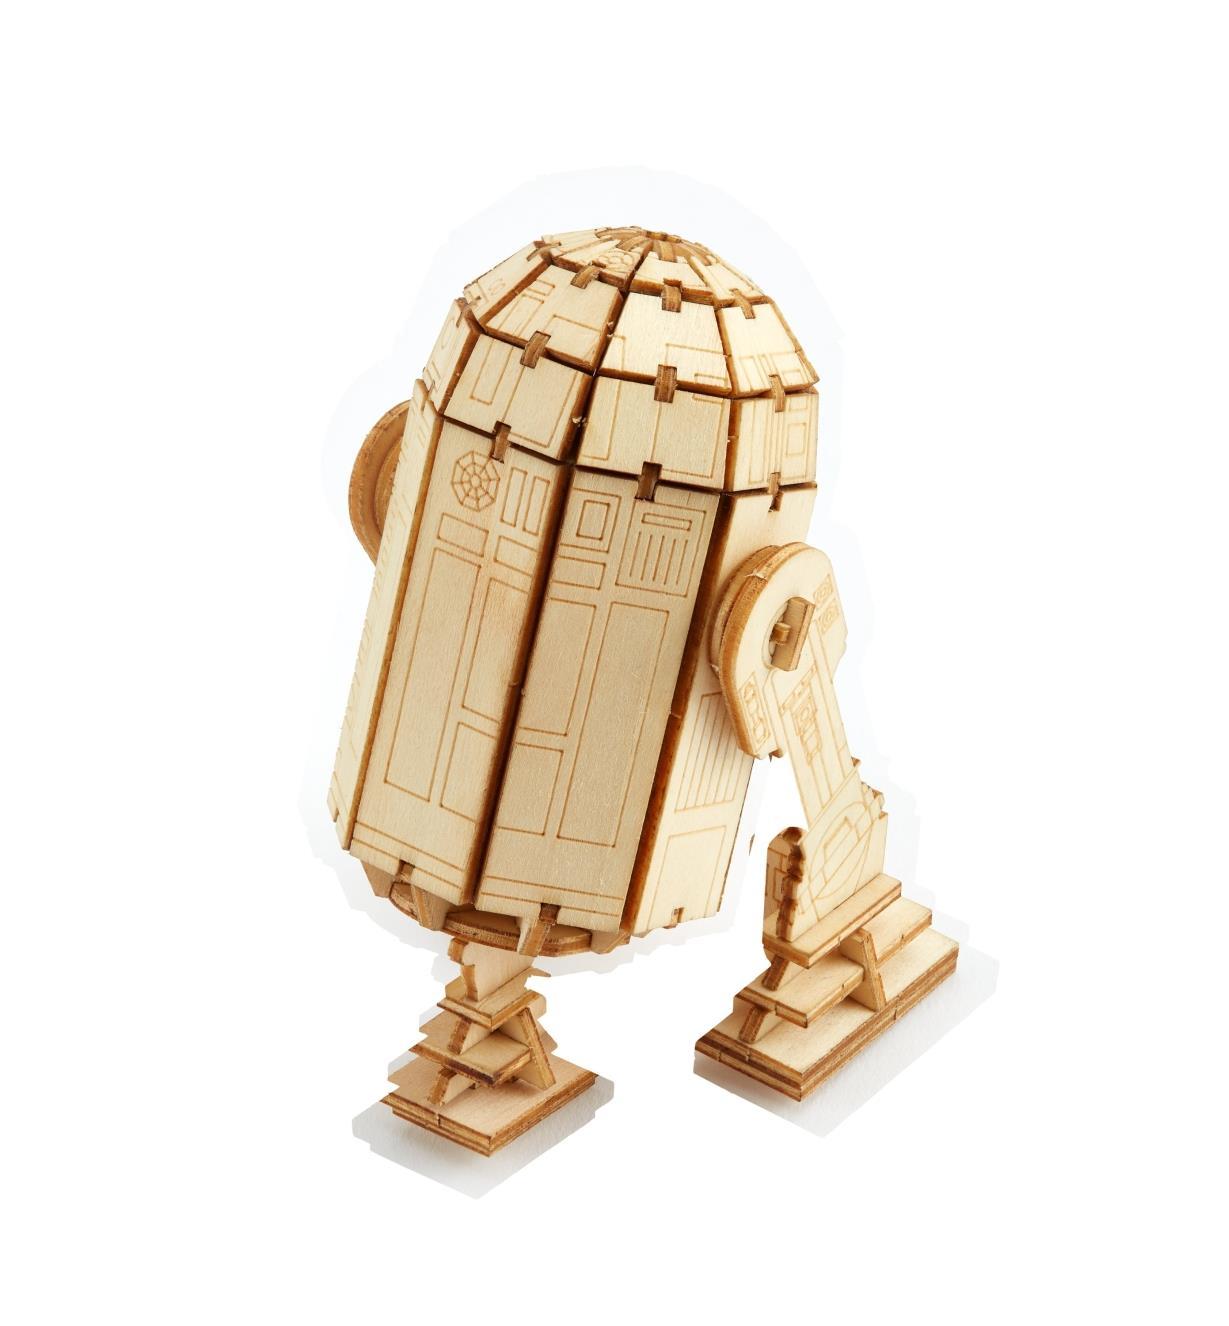 Assembled R2-D2 Wooden Model